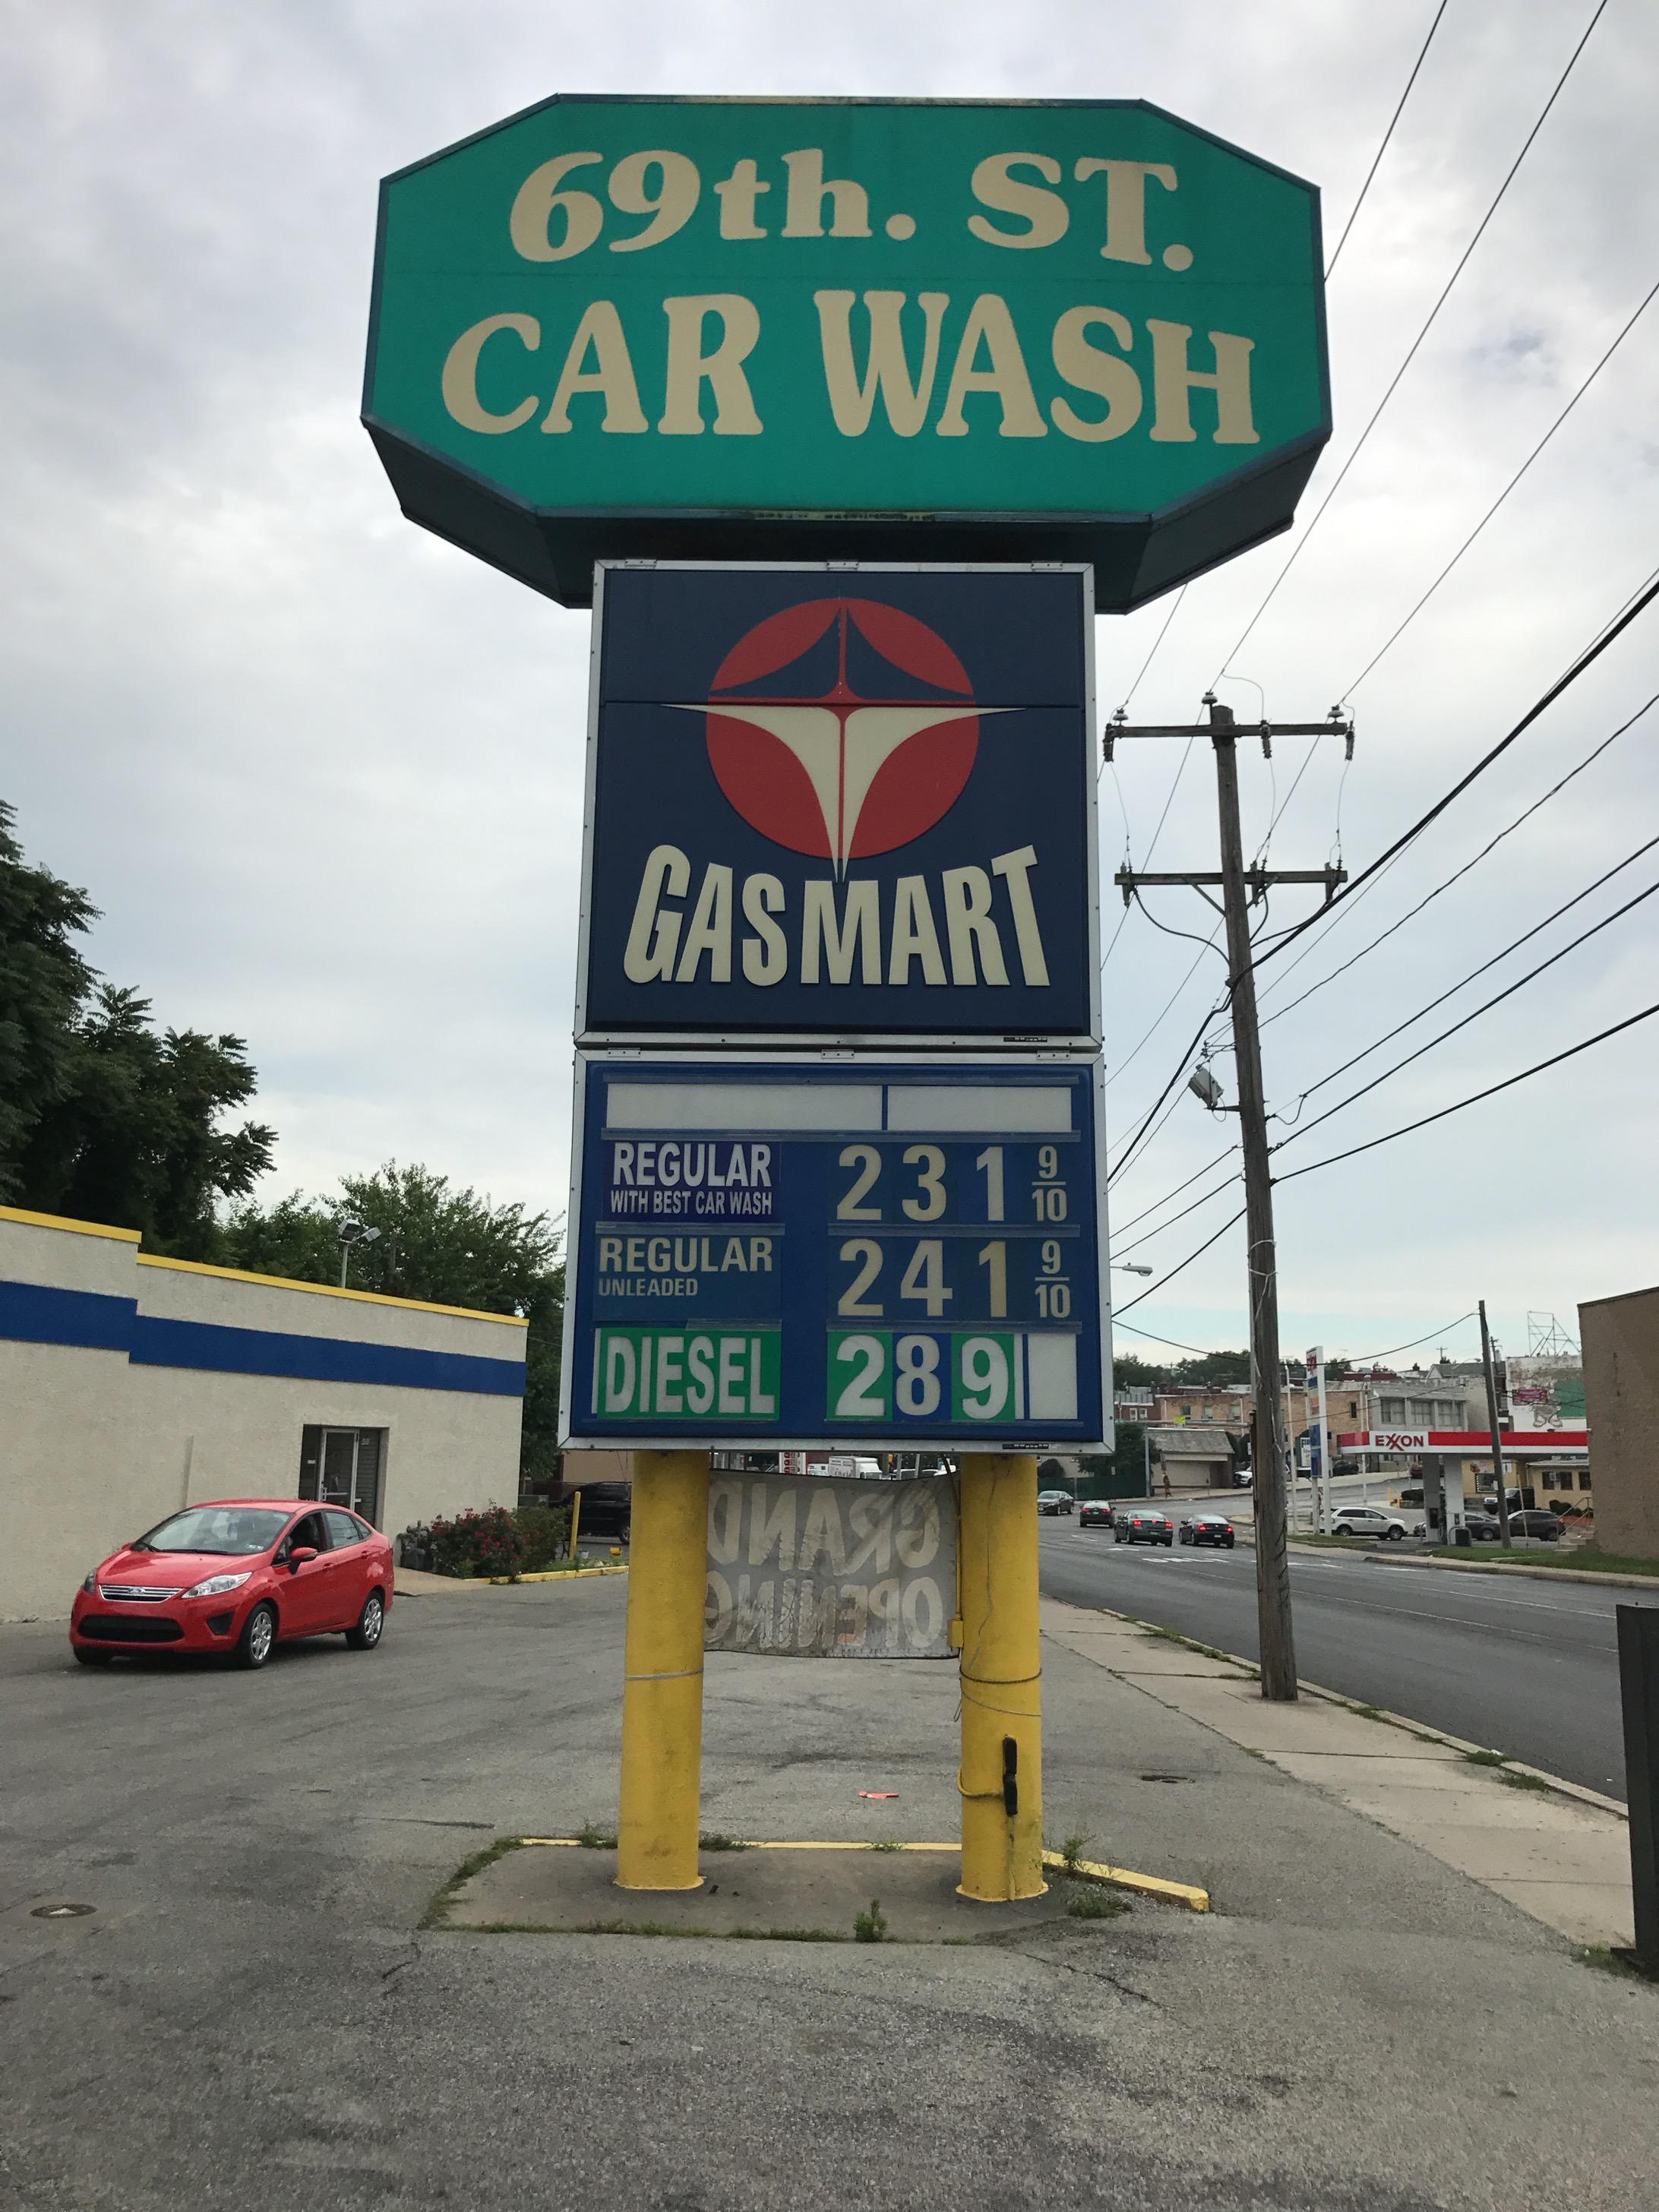 Car Wash in Upper Darby, PA